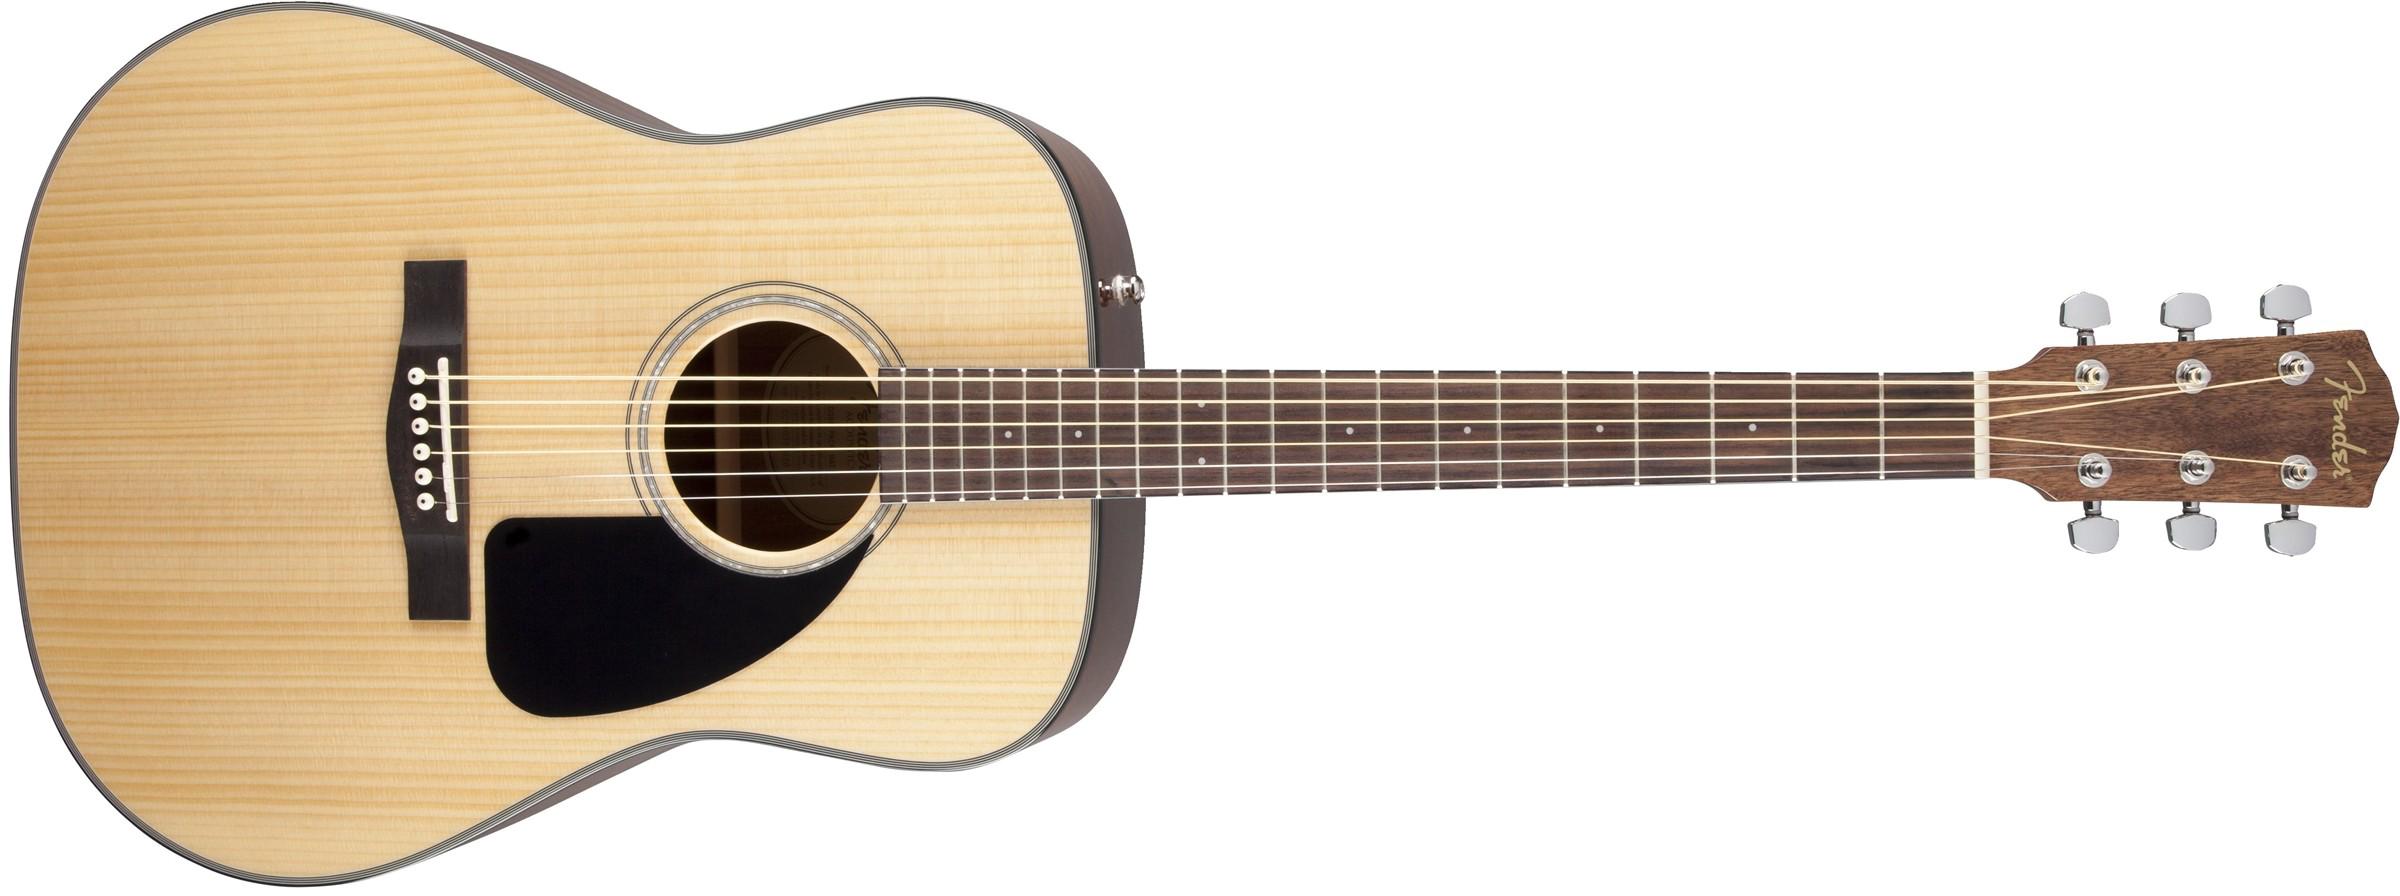 Acoustic Guitar PNG Transparent Image.